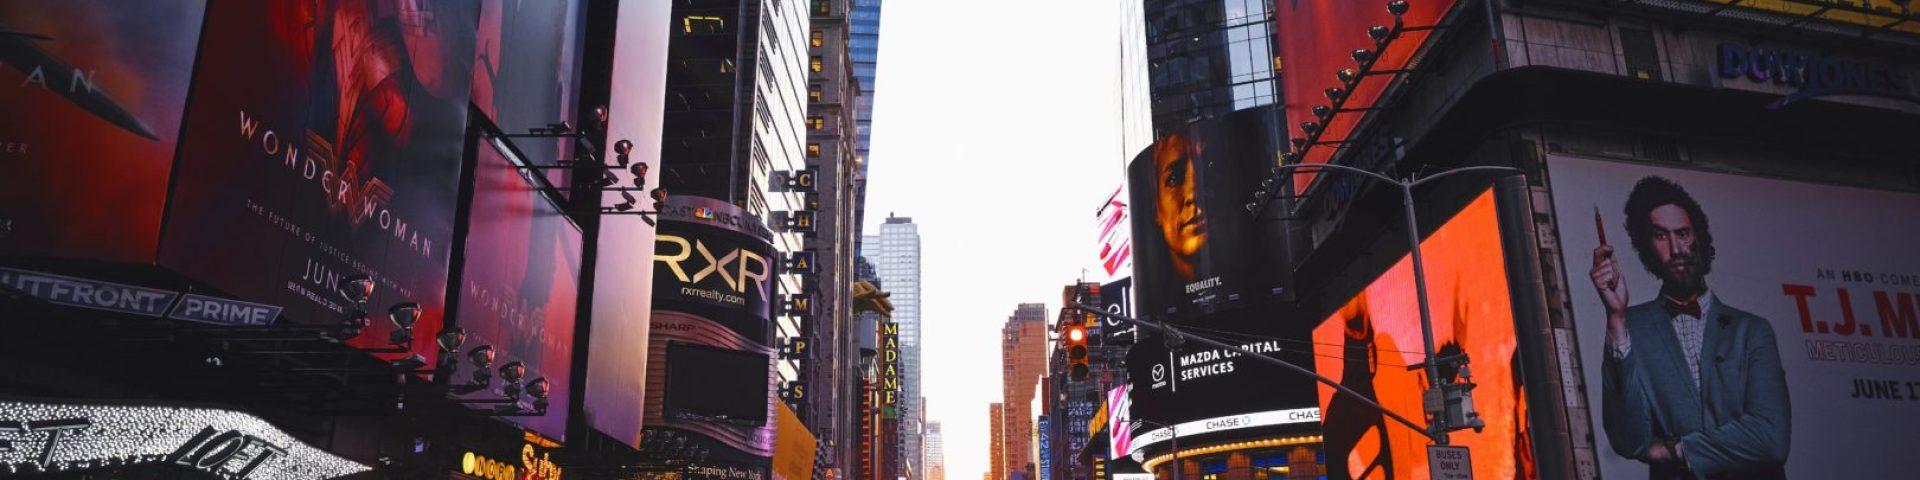 Avoiding Tourist Traps: Travel NYC Like a Local - http://thejerny.com